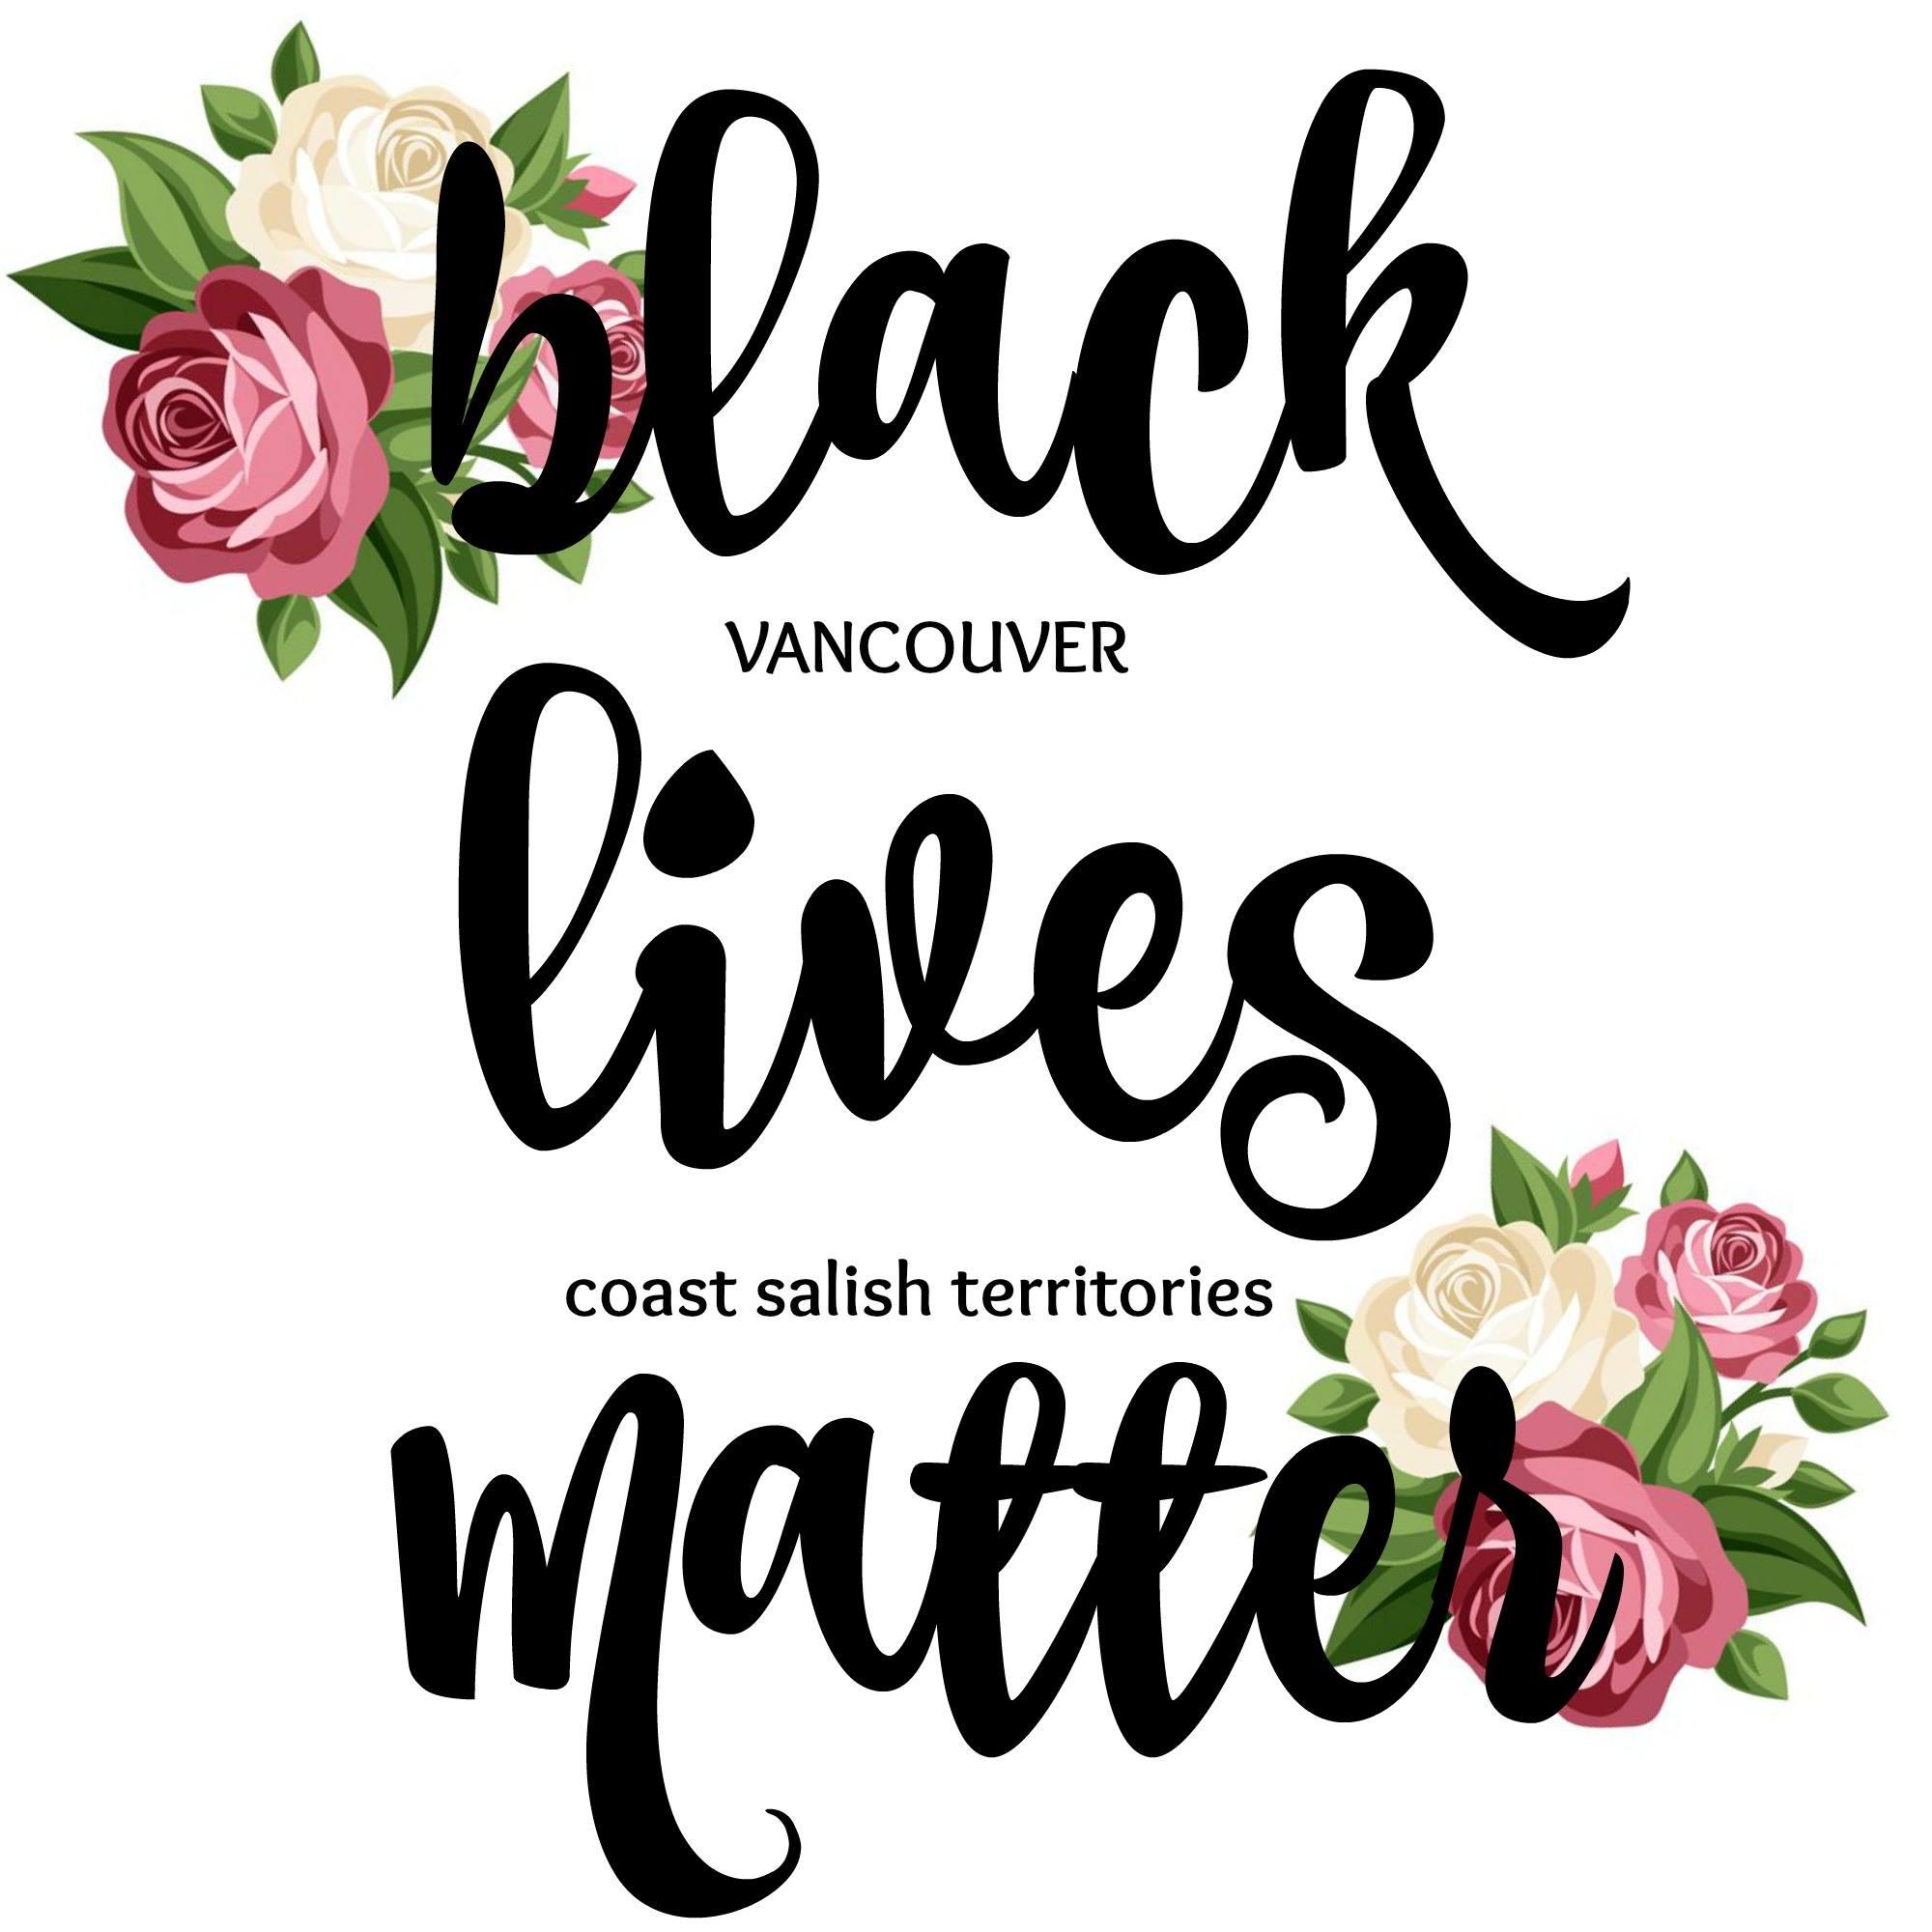 Black Lives Matter; Vancouver - Coast Salish Territories